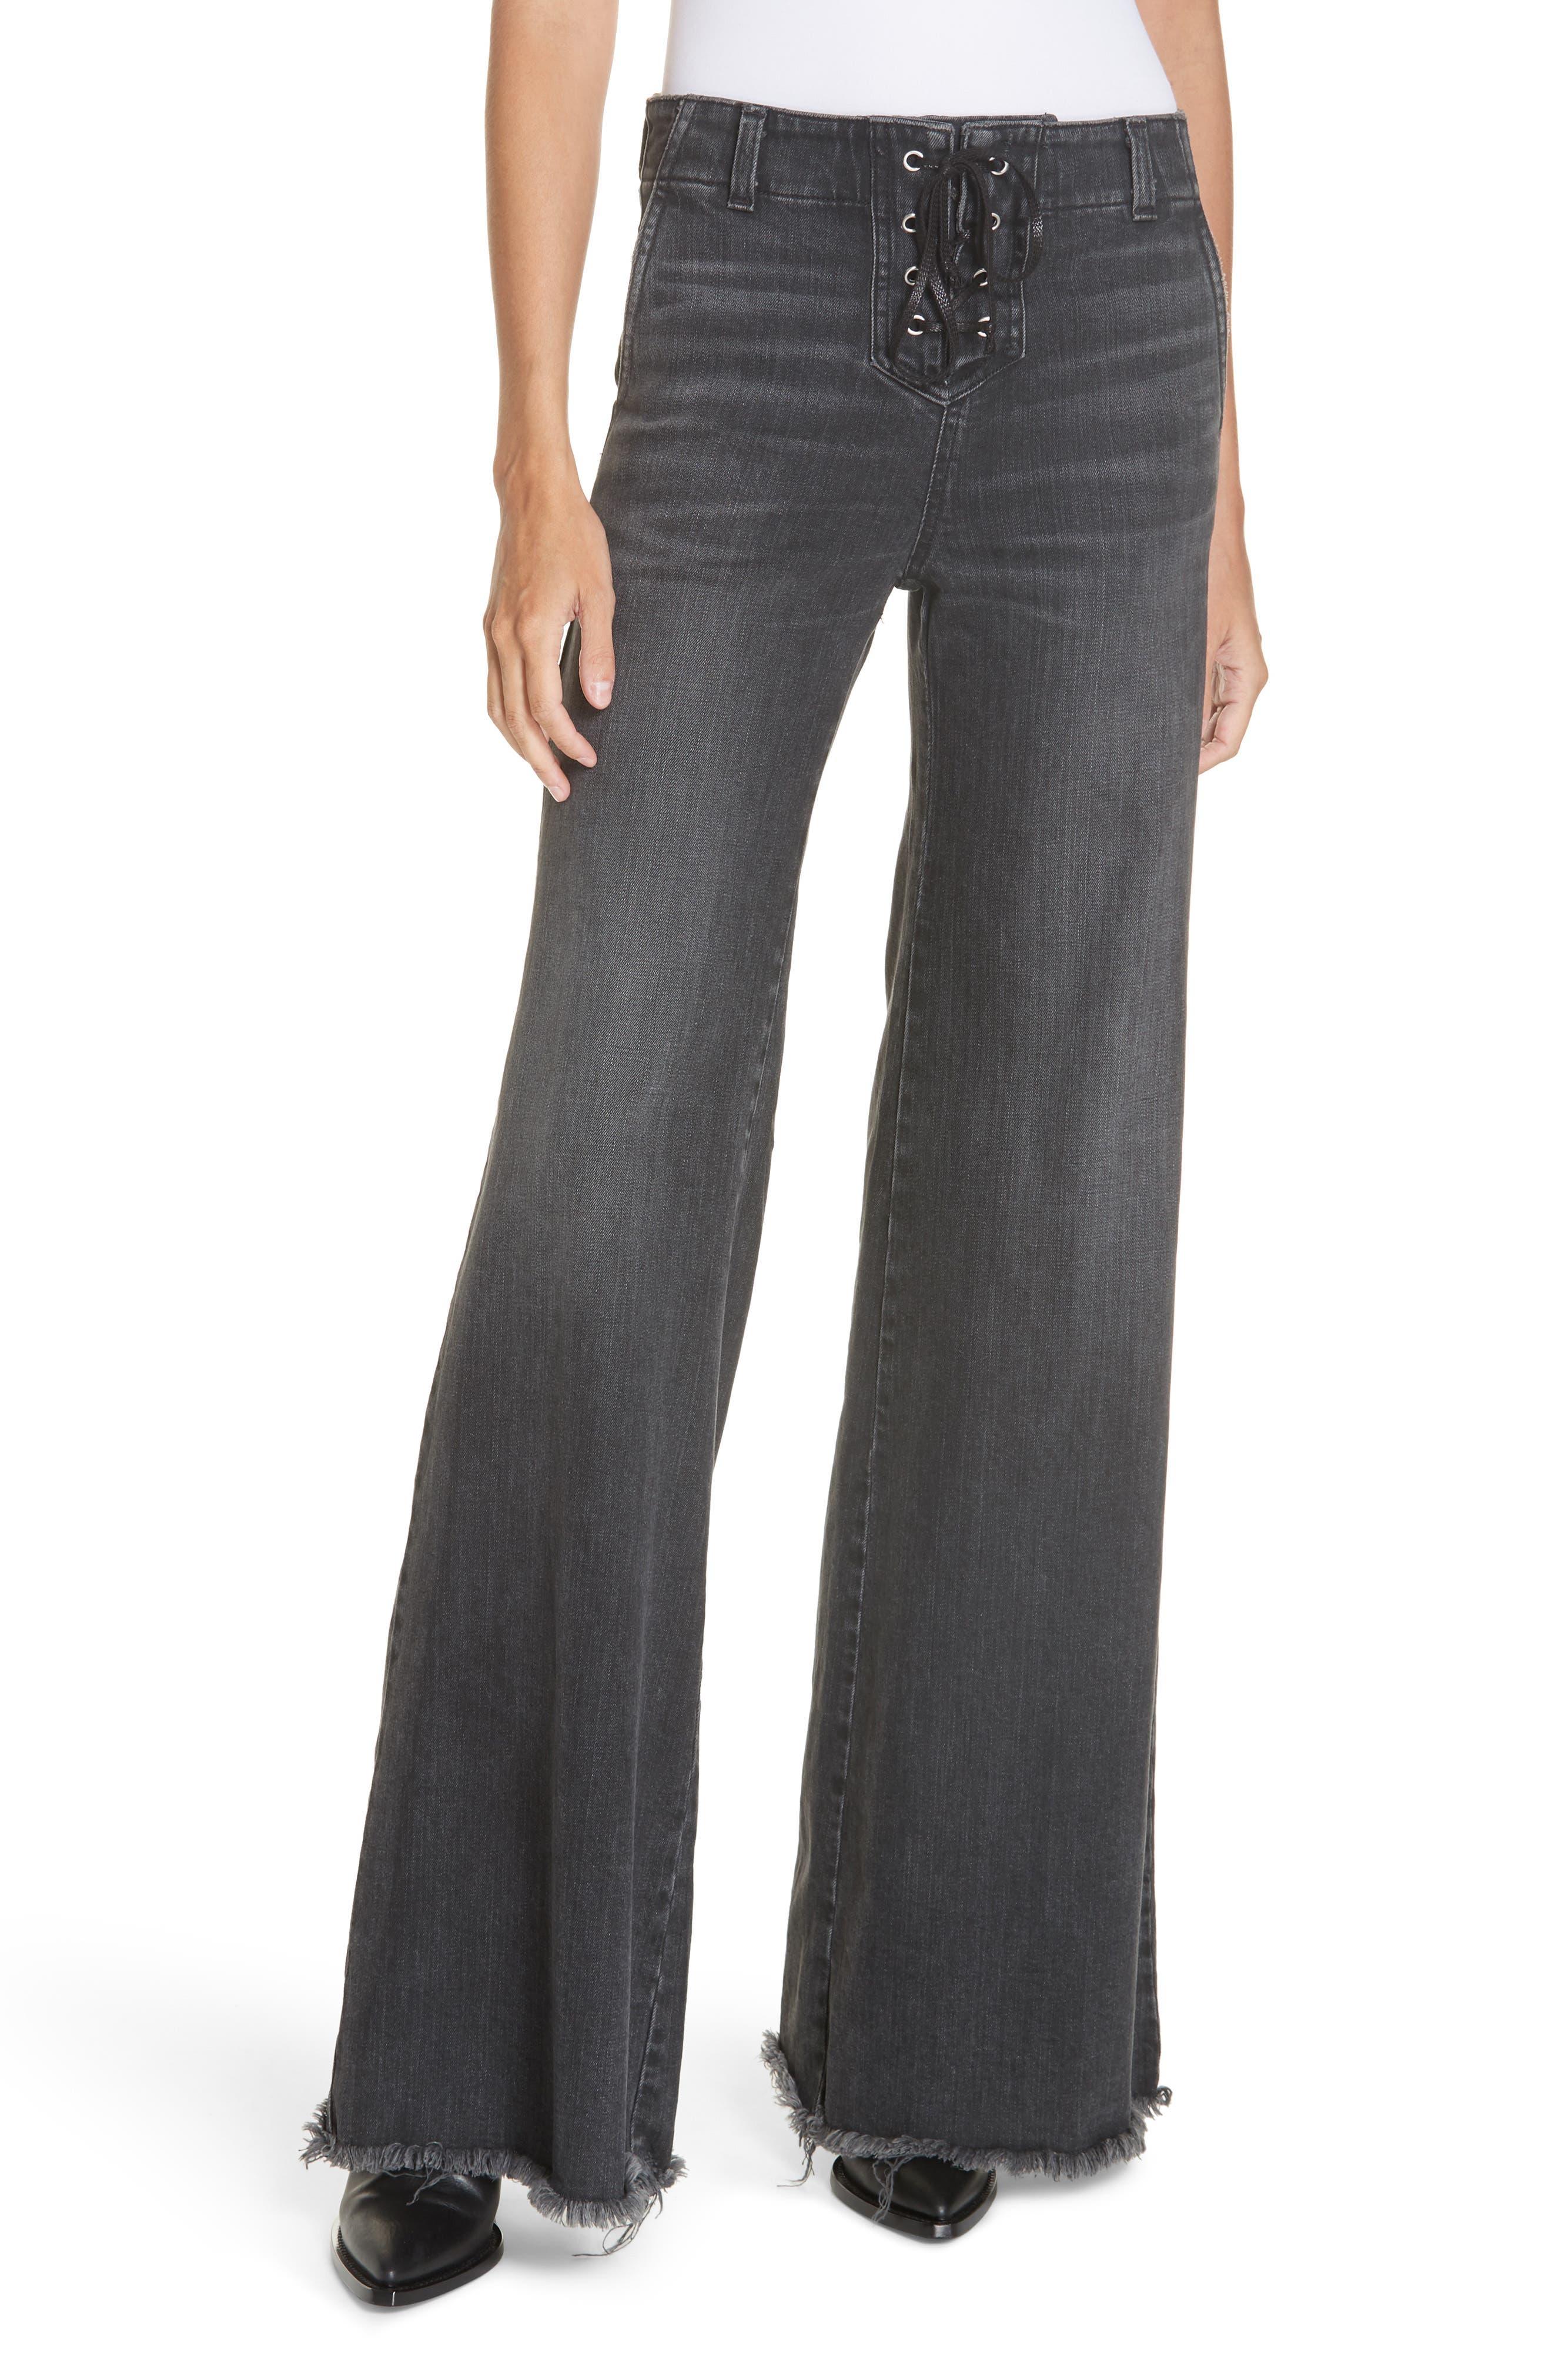 NILI LOTAN, Wade Lace-Up Wide Leg Jeans, Main thumbnail 1, color, VINTAGE BLACK